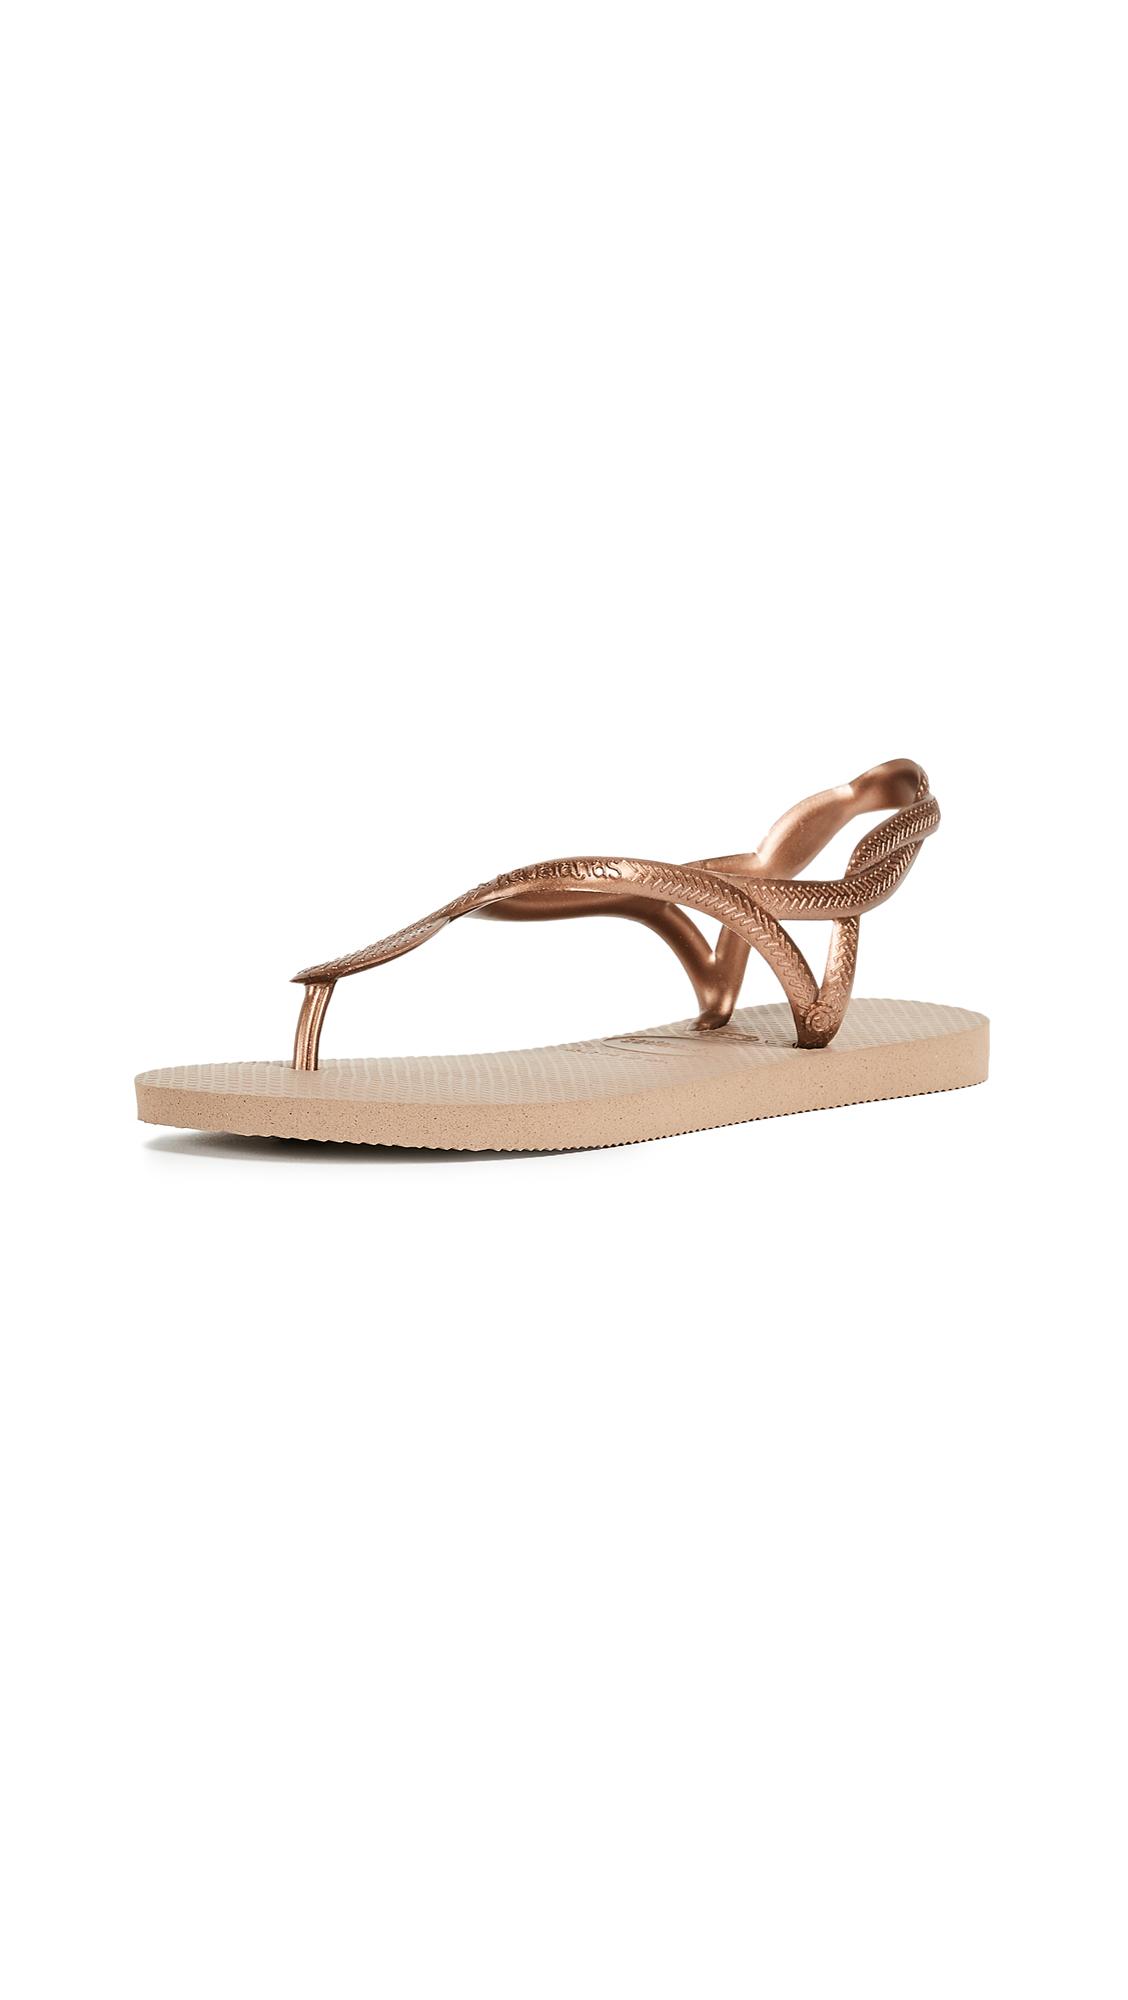 Havaianas Luna Sandals - Rose Gold/Rose Gold